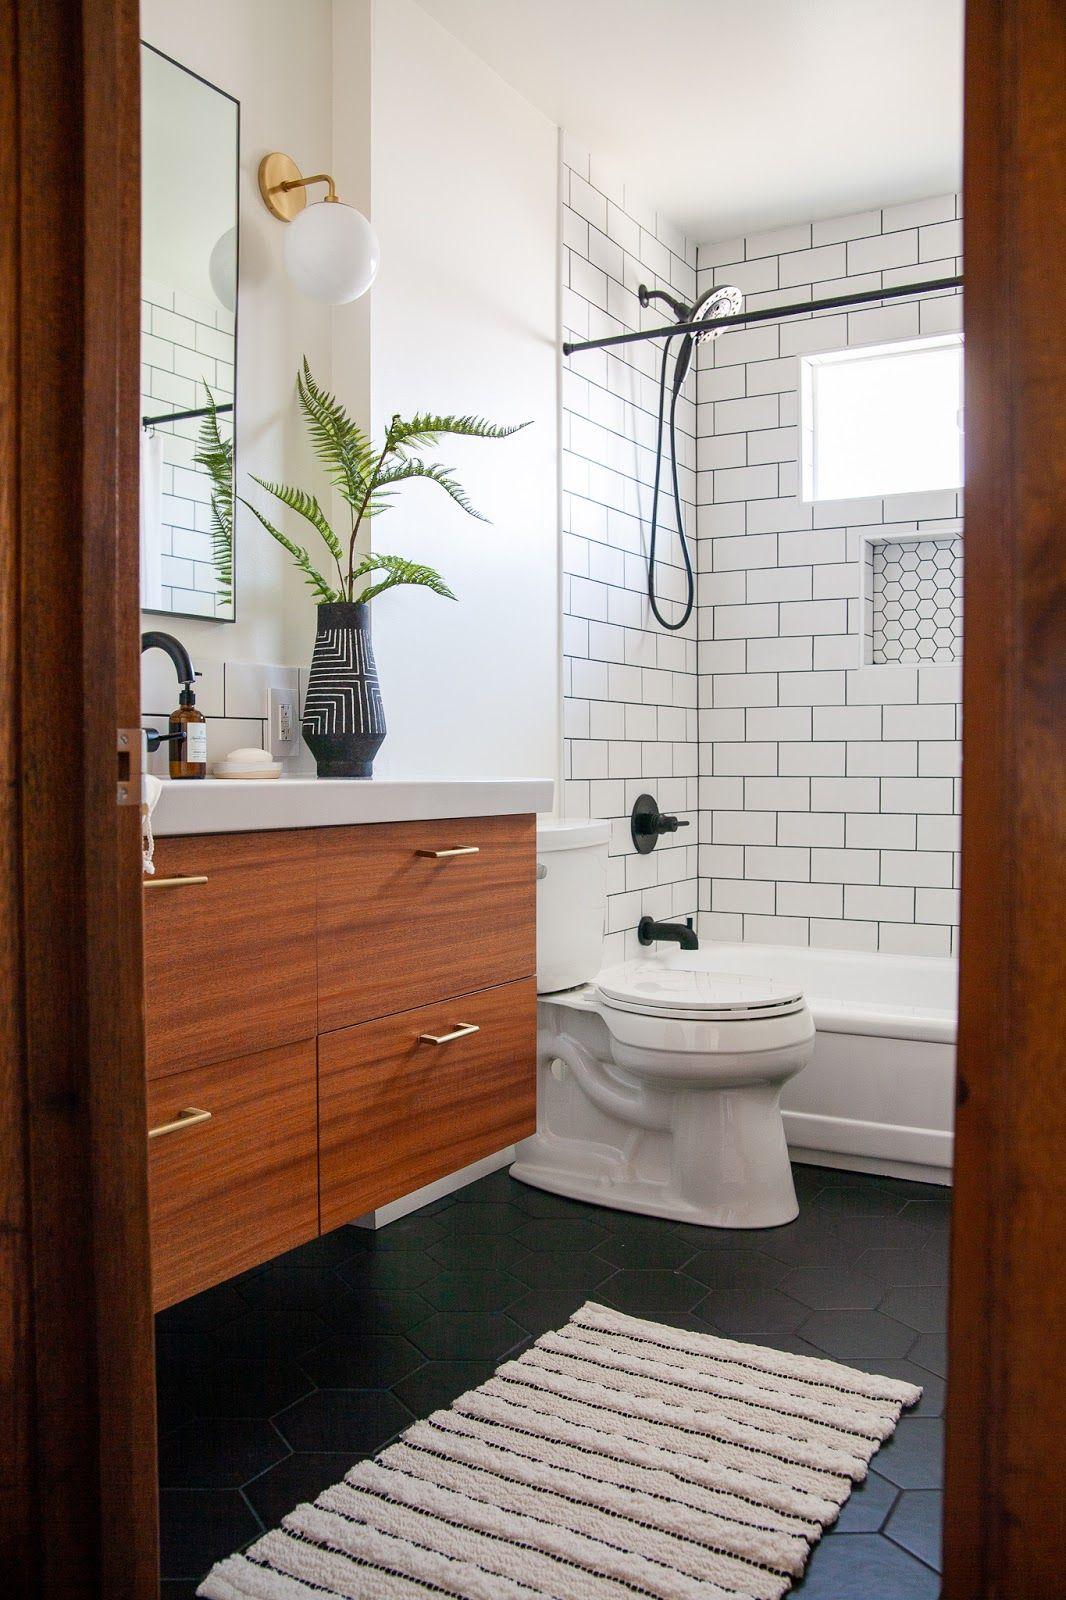 Modern bathroom renovation REVEAL: The finished One Room Challenge!